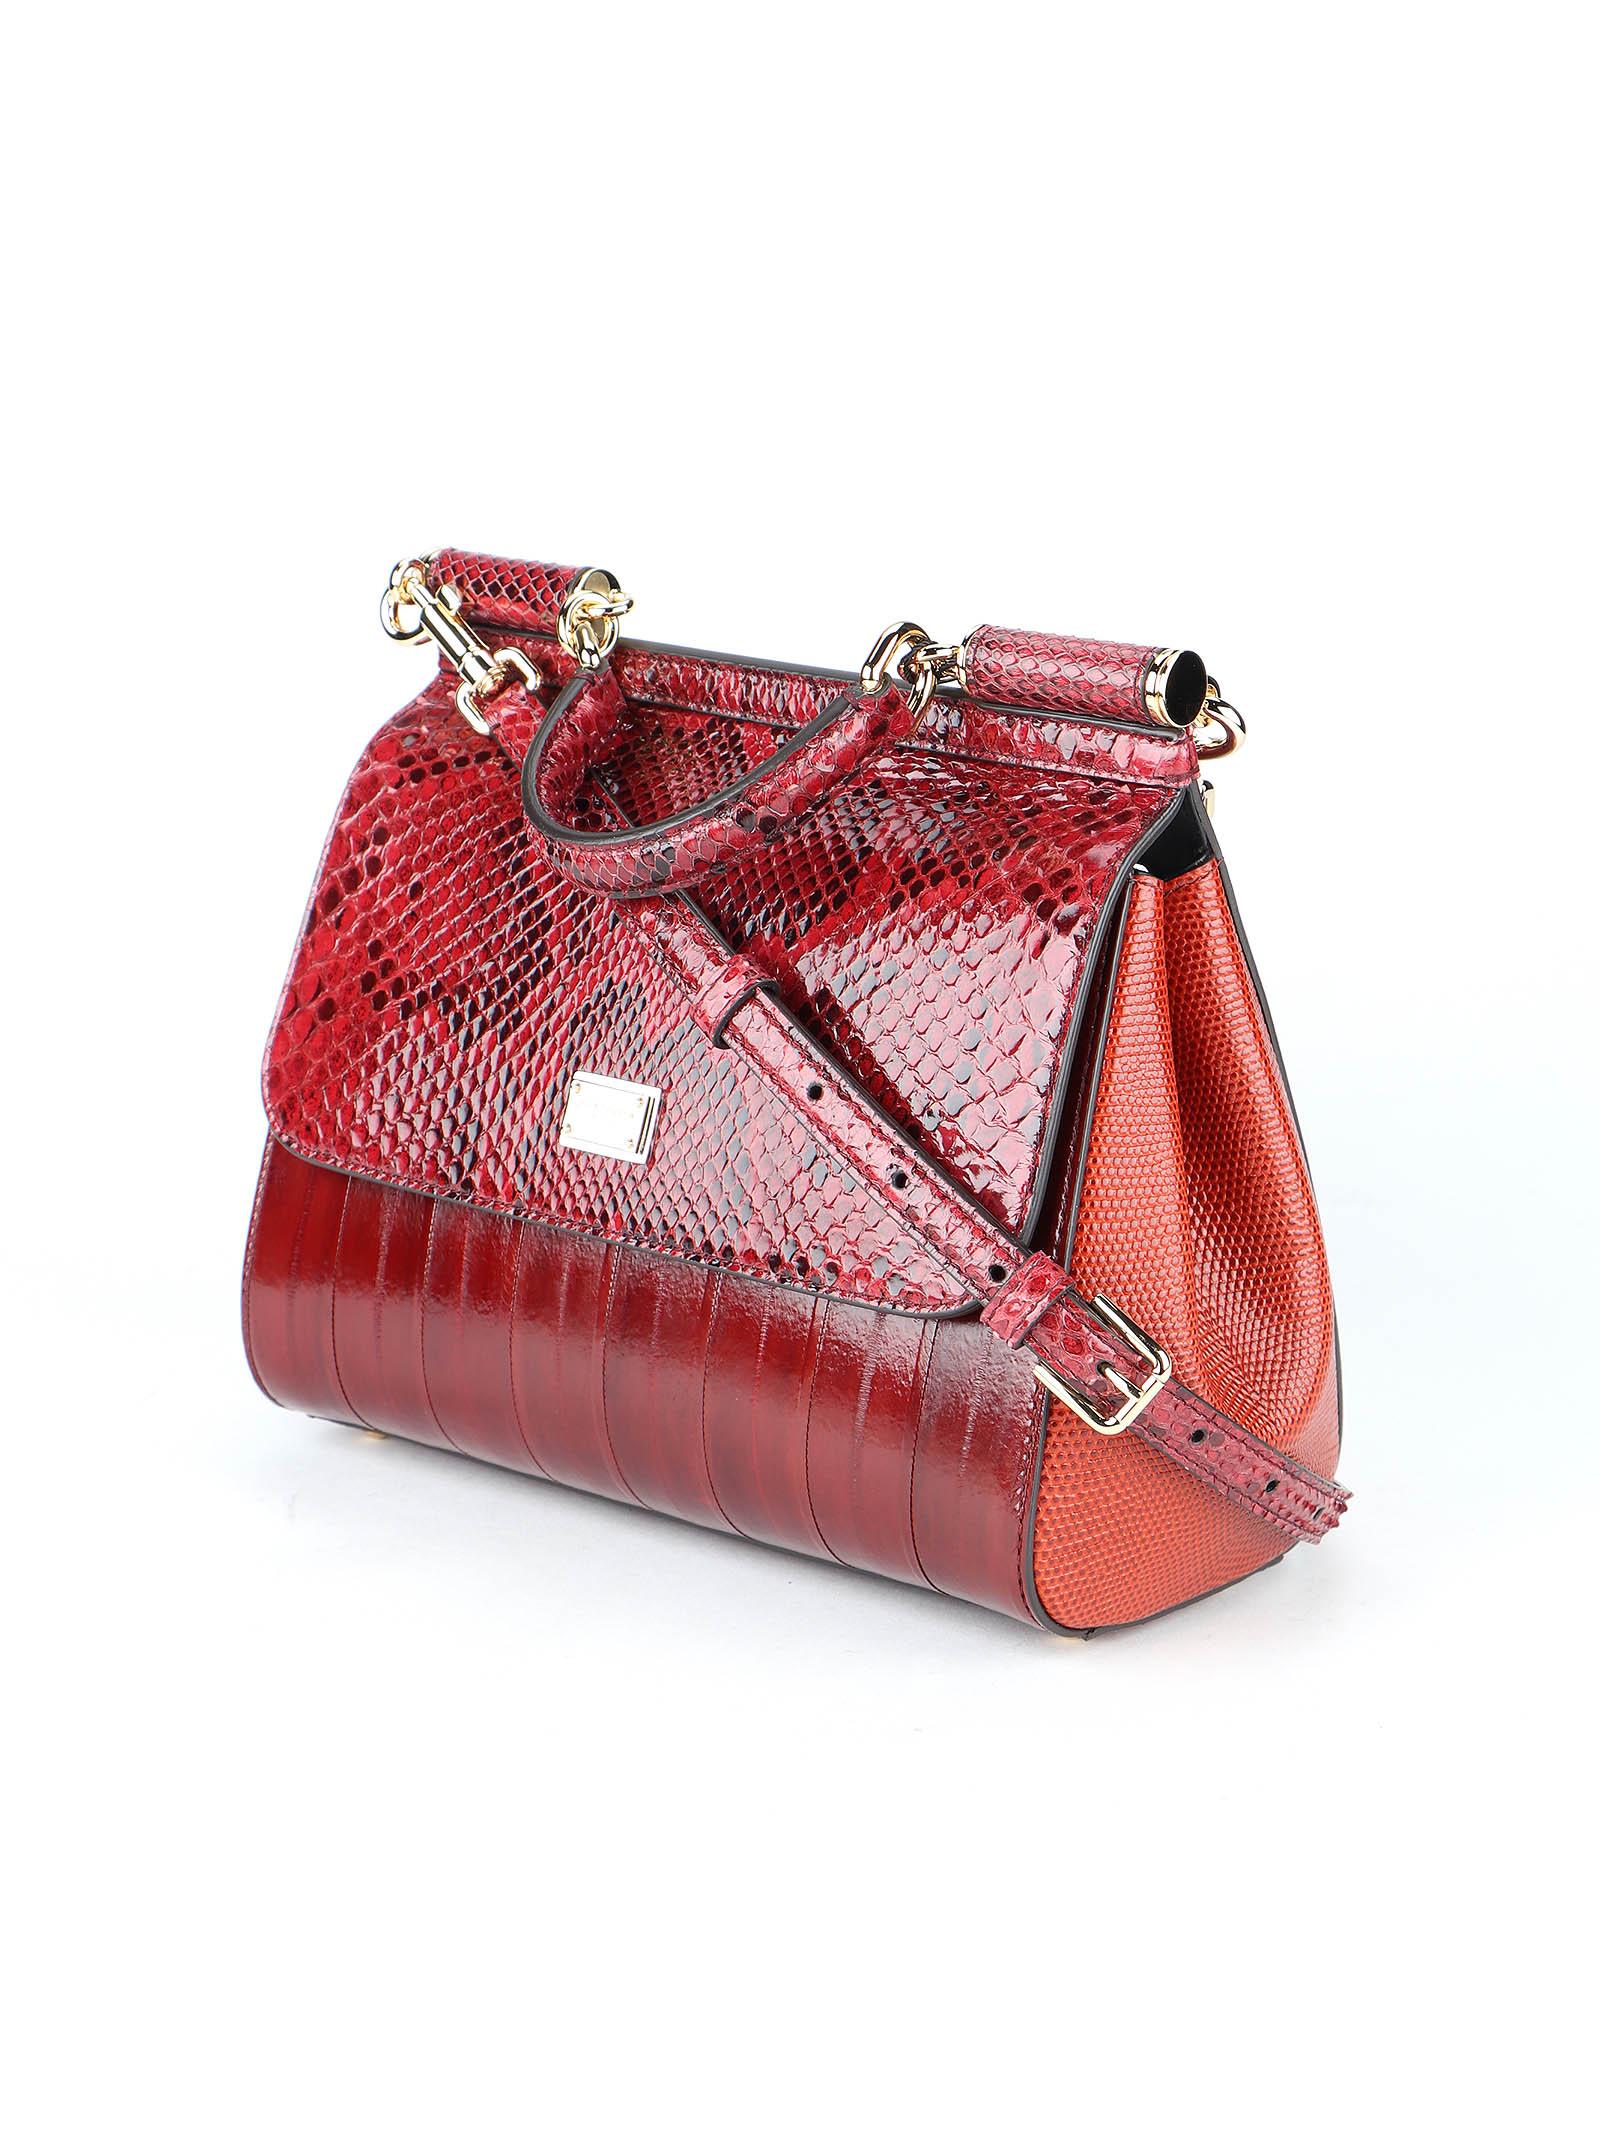 Picture of Dolce & Gabbana   Medium Sicily Bag